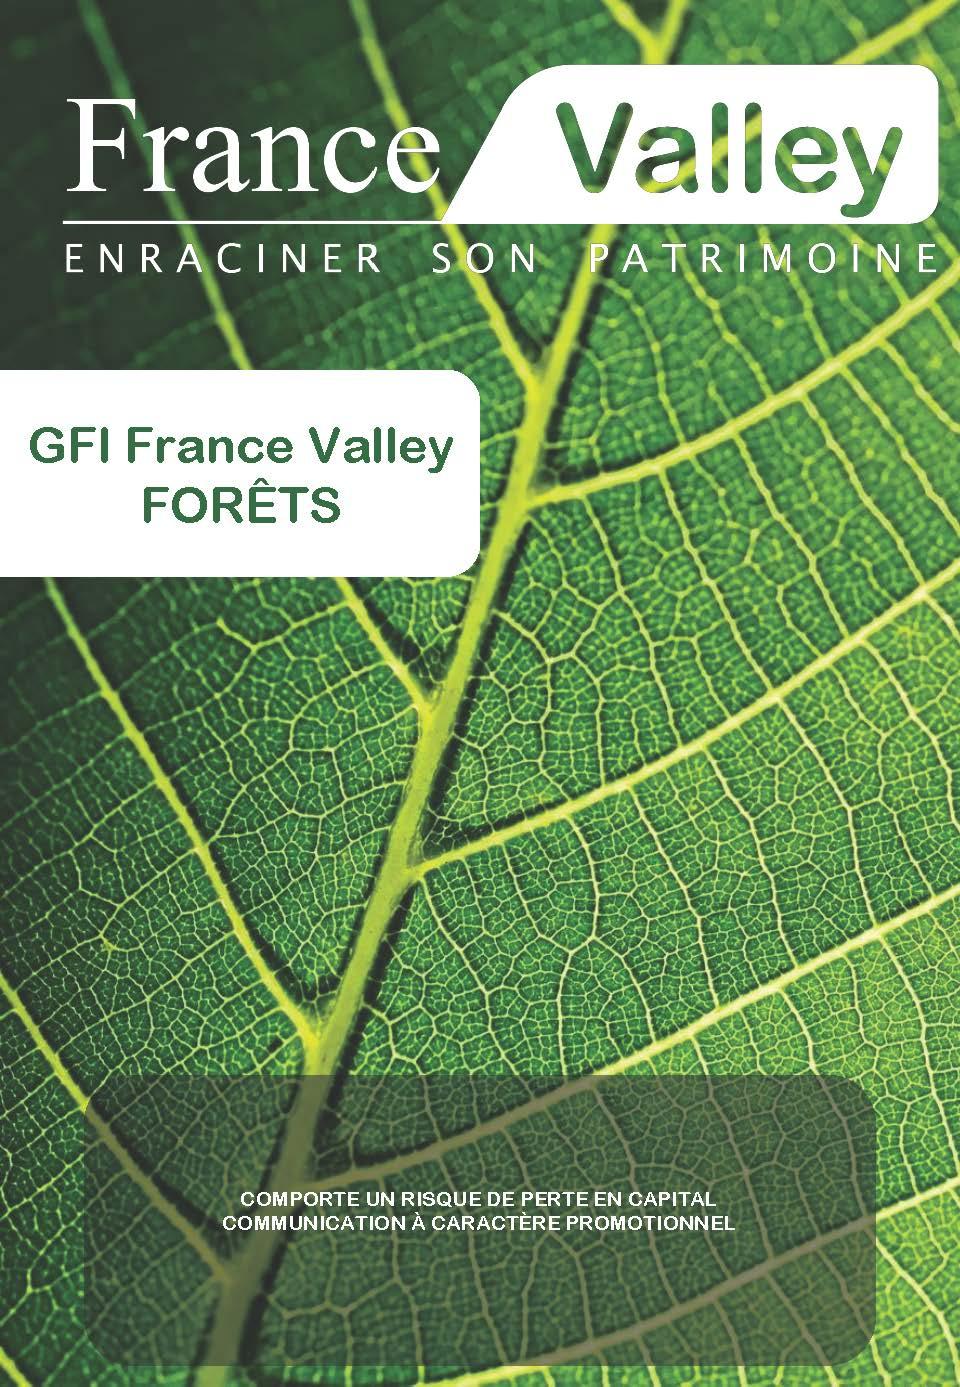 GFI FRANCE VALLEY